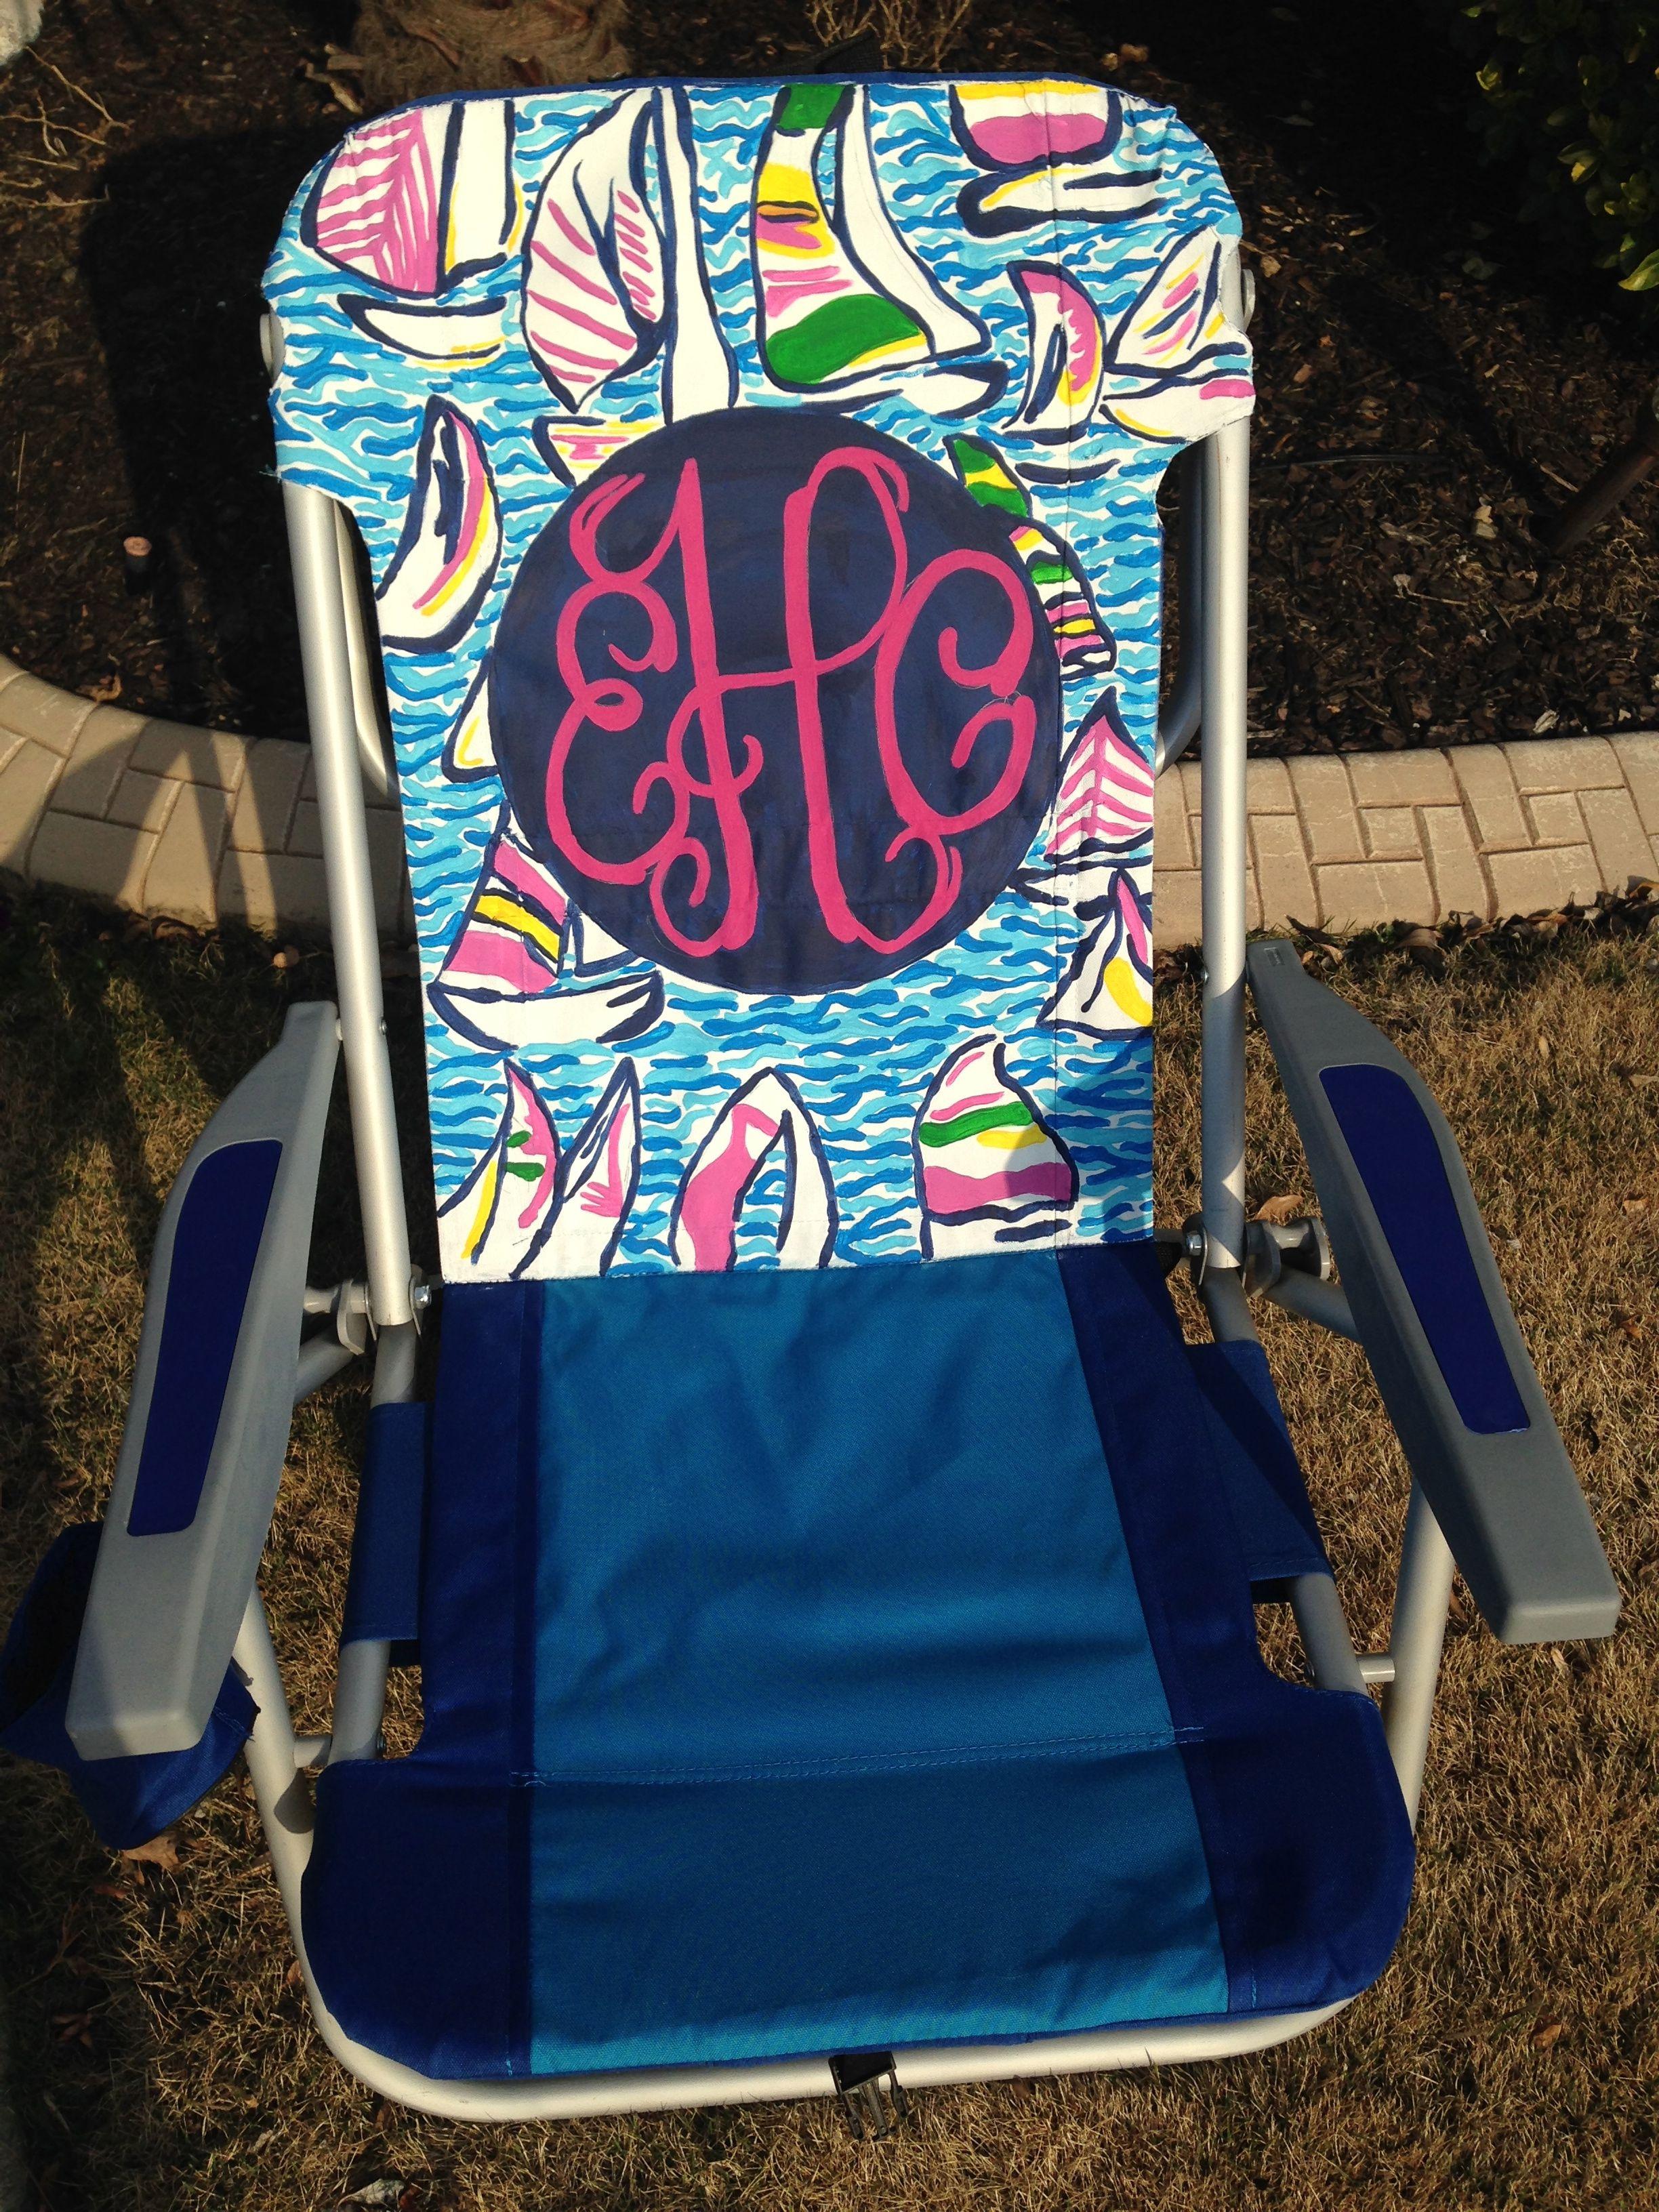 Lilly Pulitzer Inspired Monogram Beach Chair!